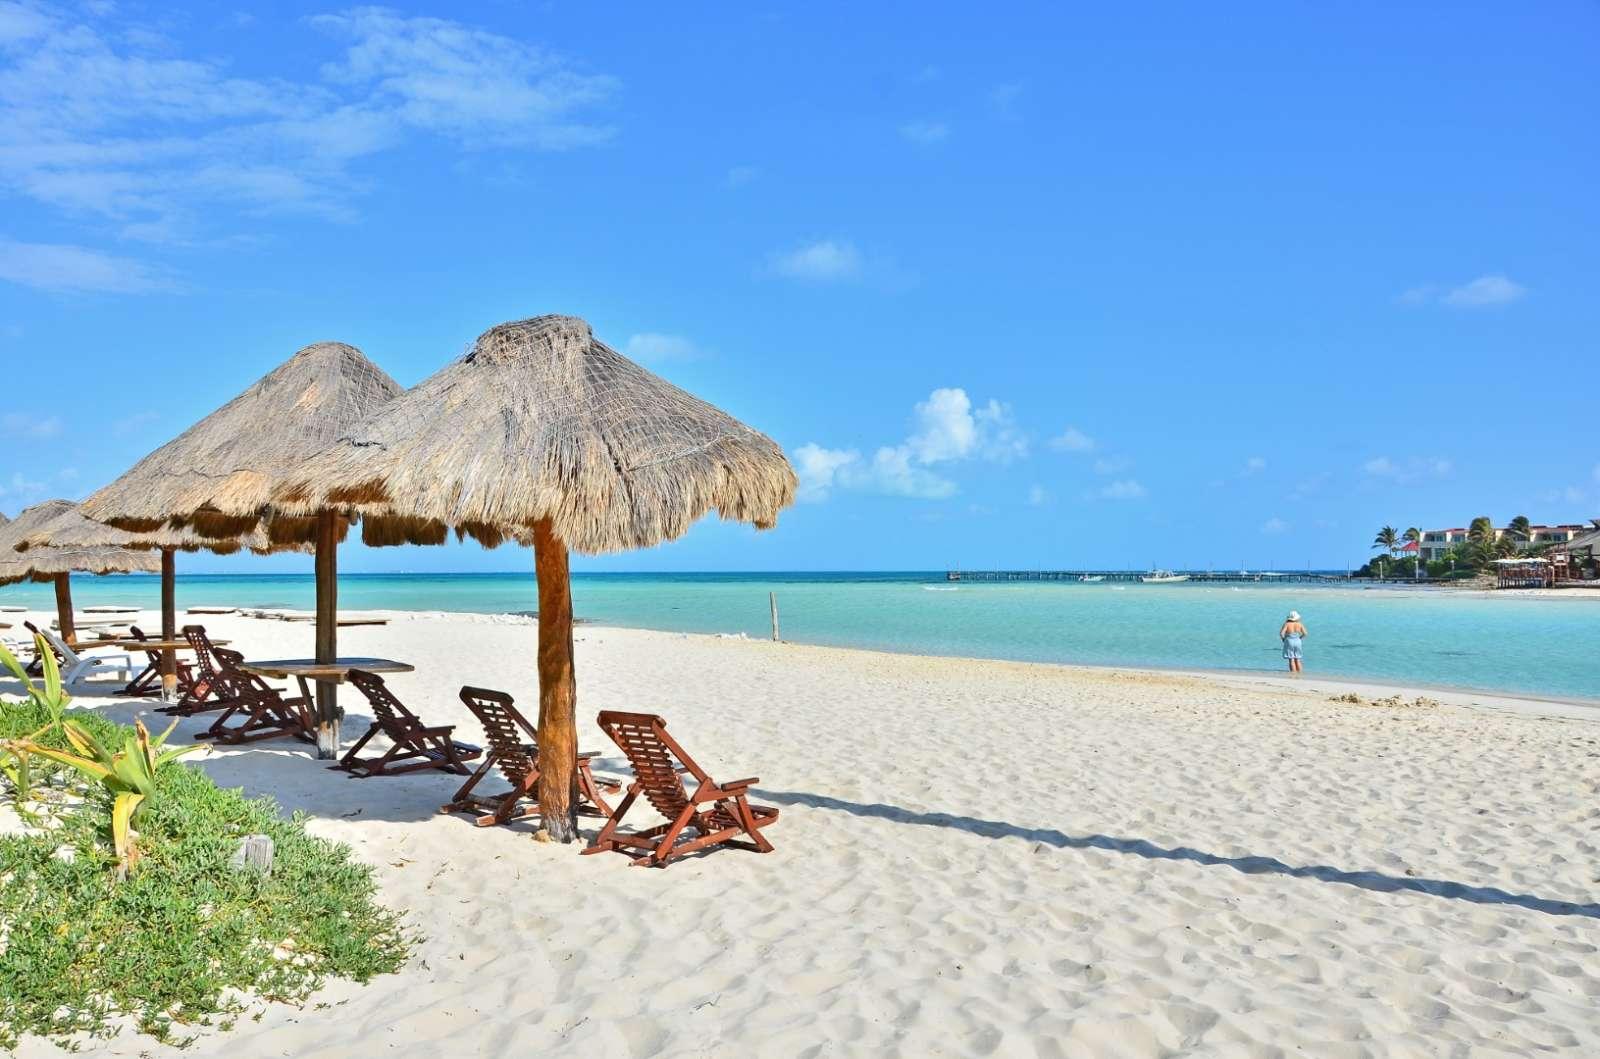 Beach palapas on Isla Mujeres Mexico